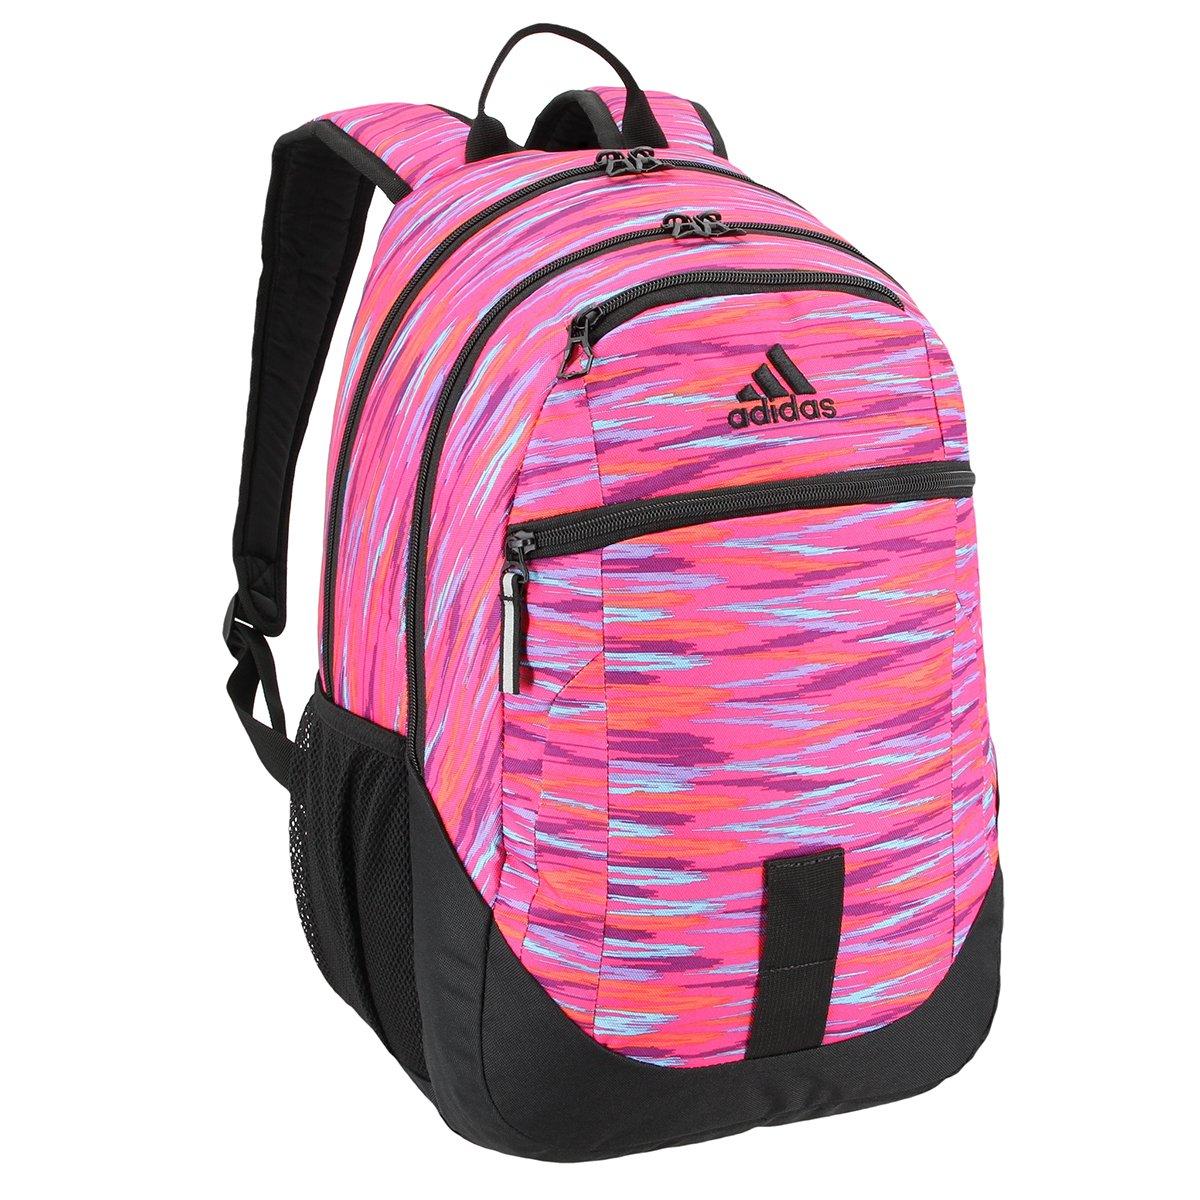 adidas Unisex Foundation Backpack, Twister Shock Pink/Black, ONE SIZE by adidas